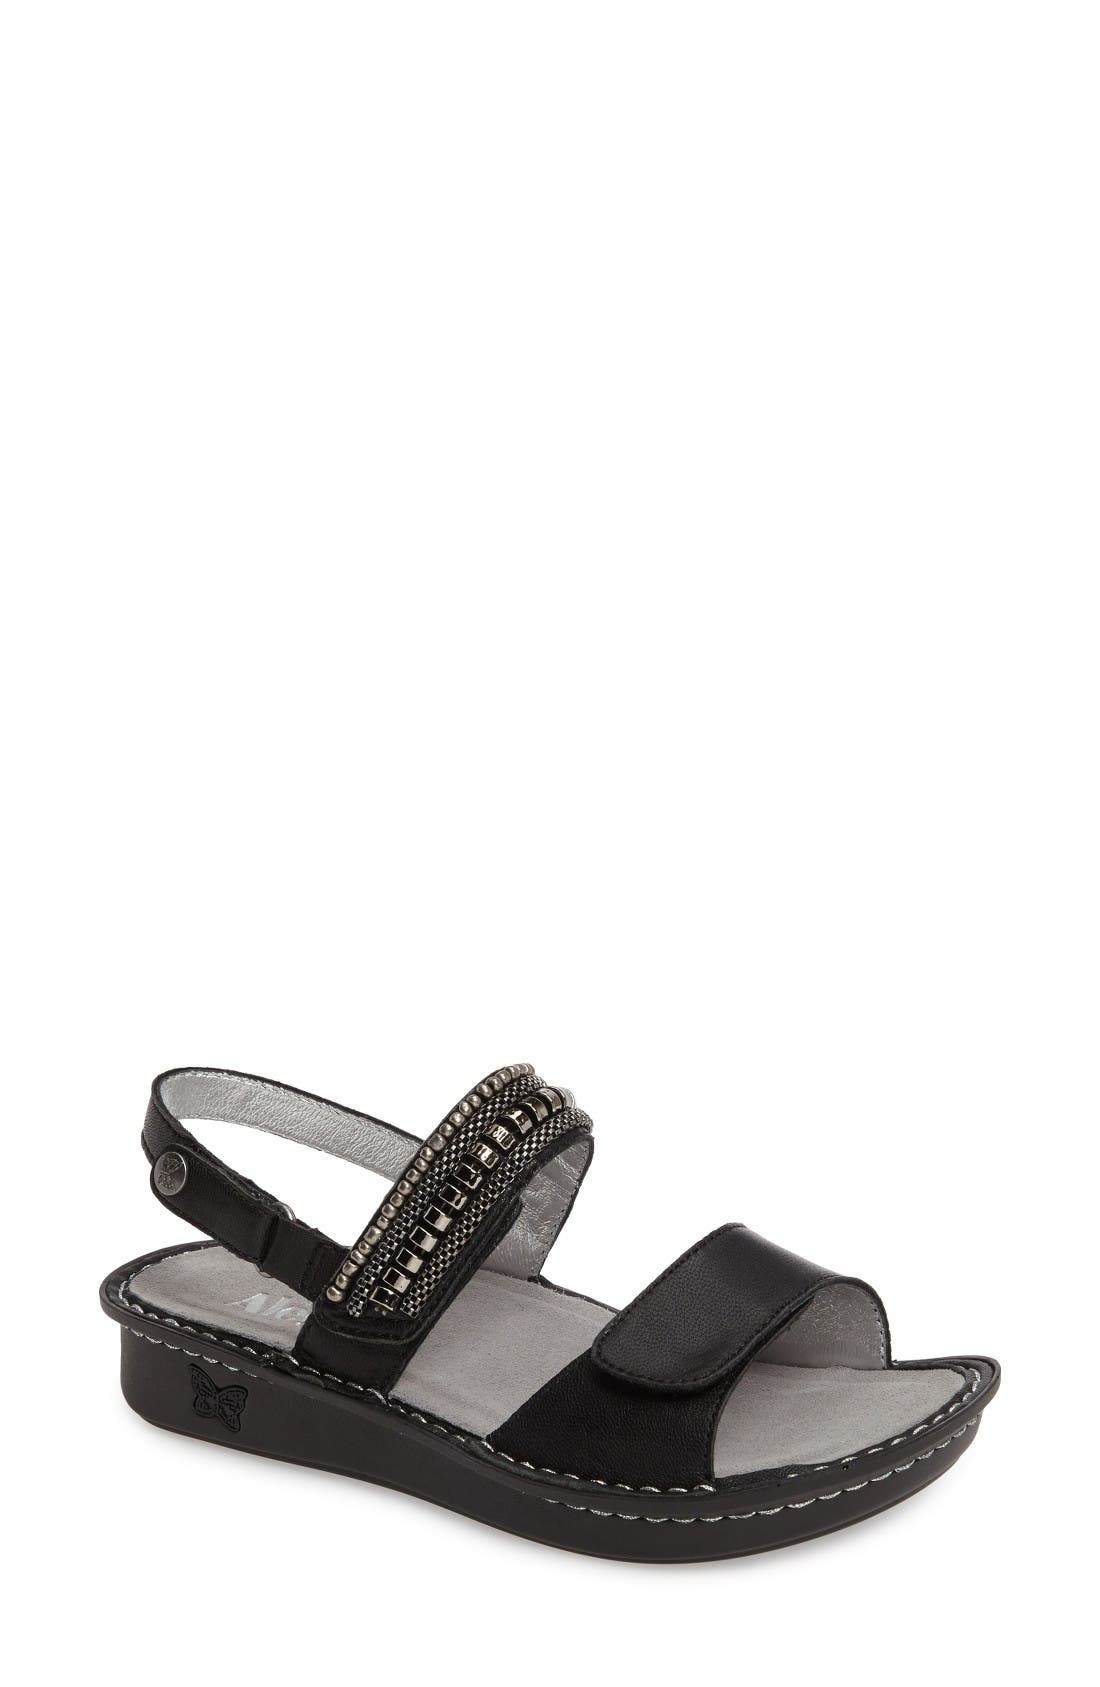 Alternate Image 1 Selected - Alegria 'Verona' Sandal (Women)